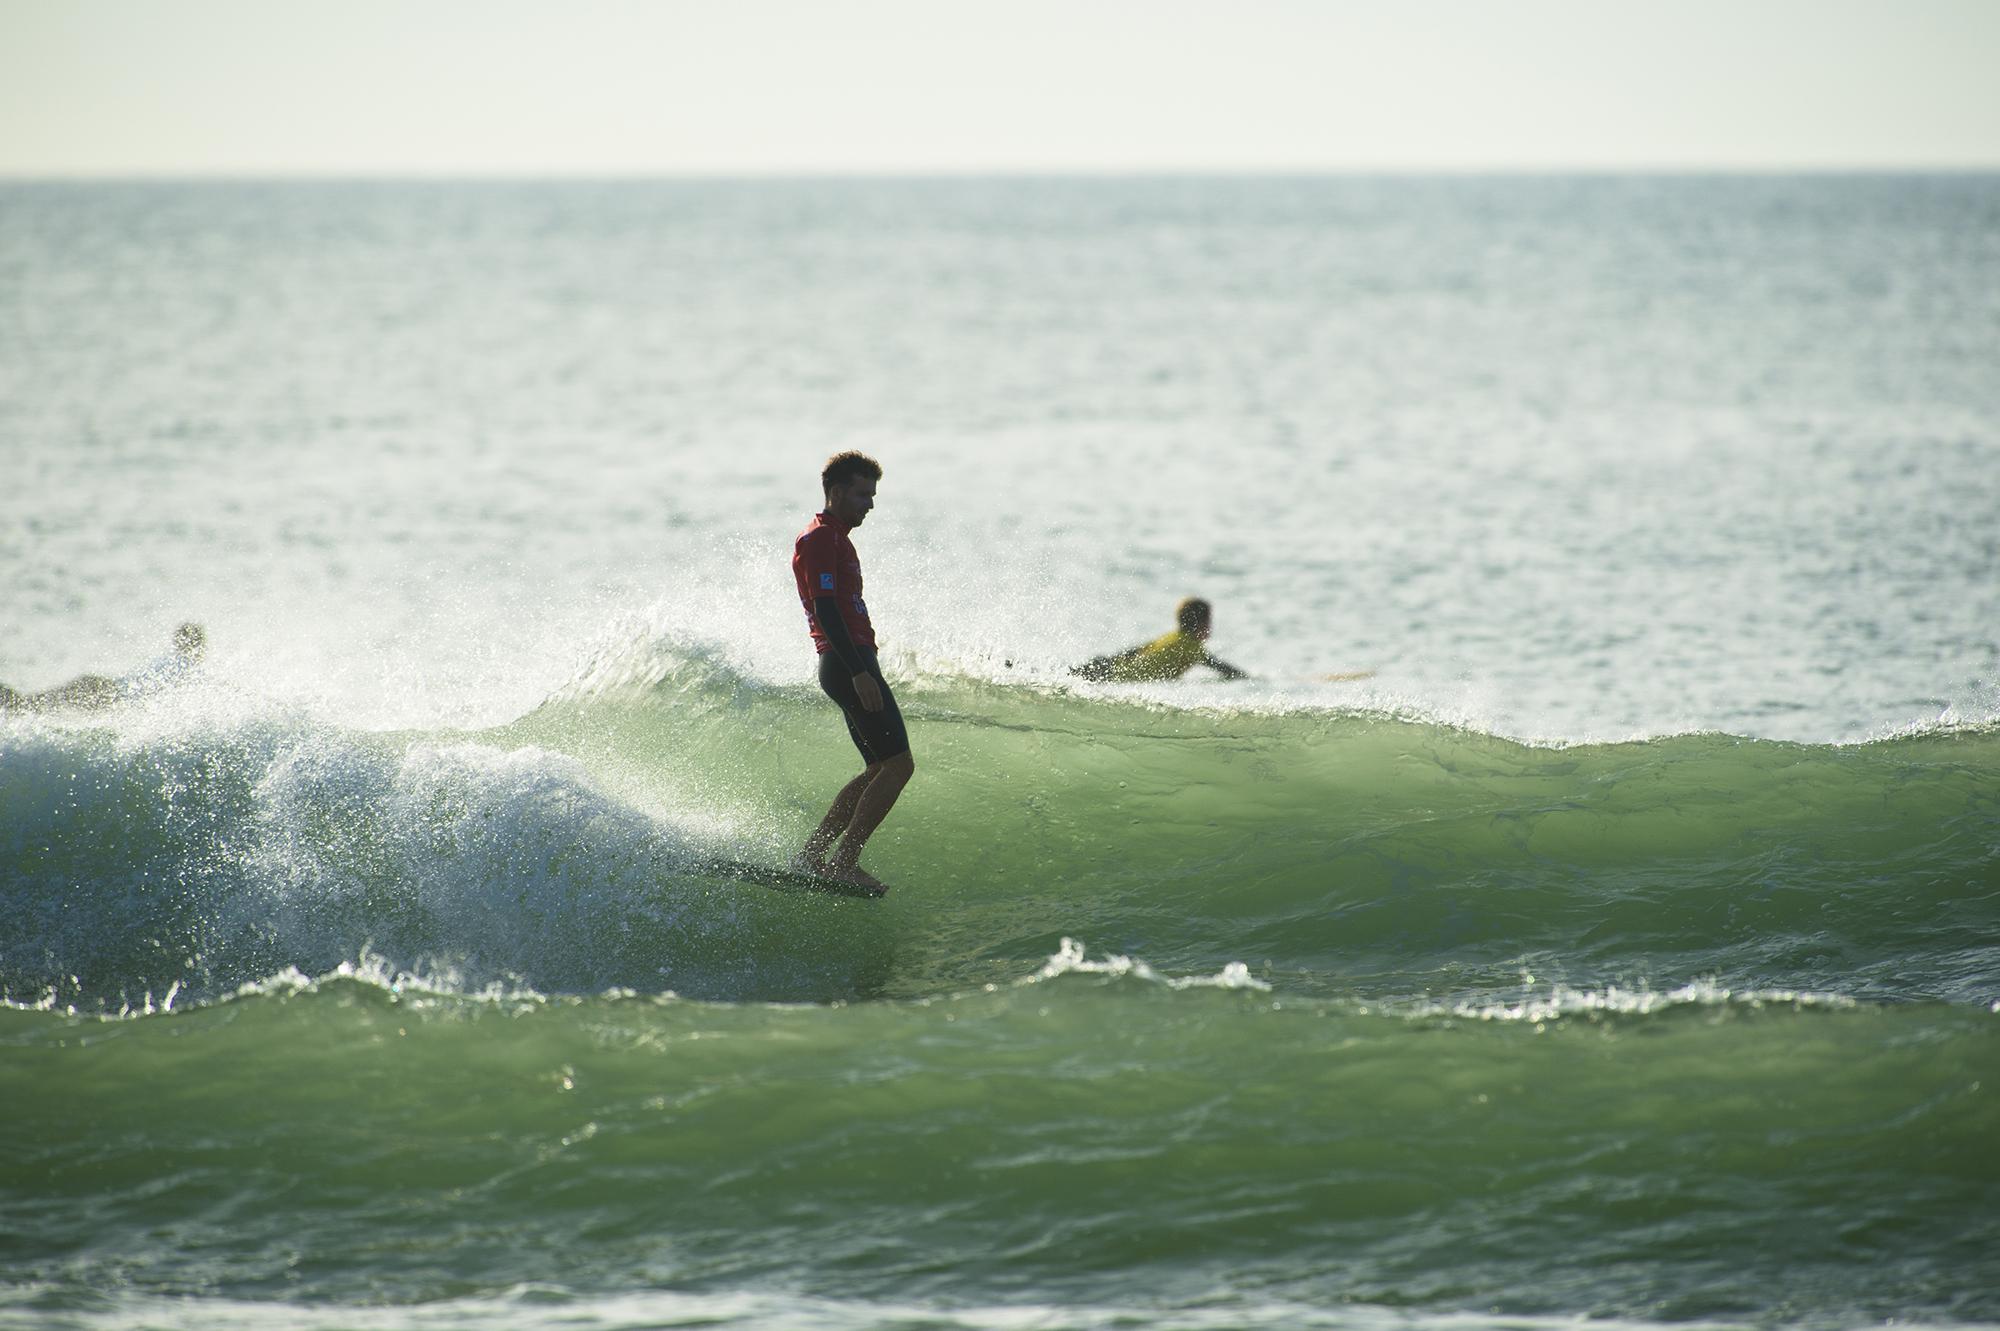 nathan-sadoun-french-surfing-championships-2017-hossegor-we-creative-antoine-justes